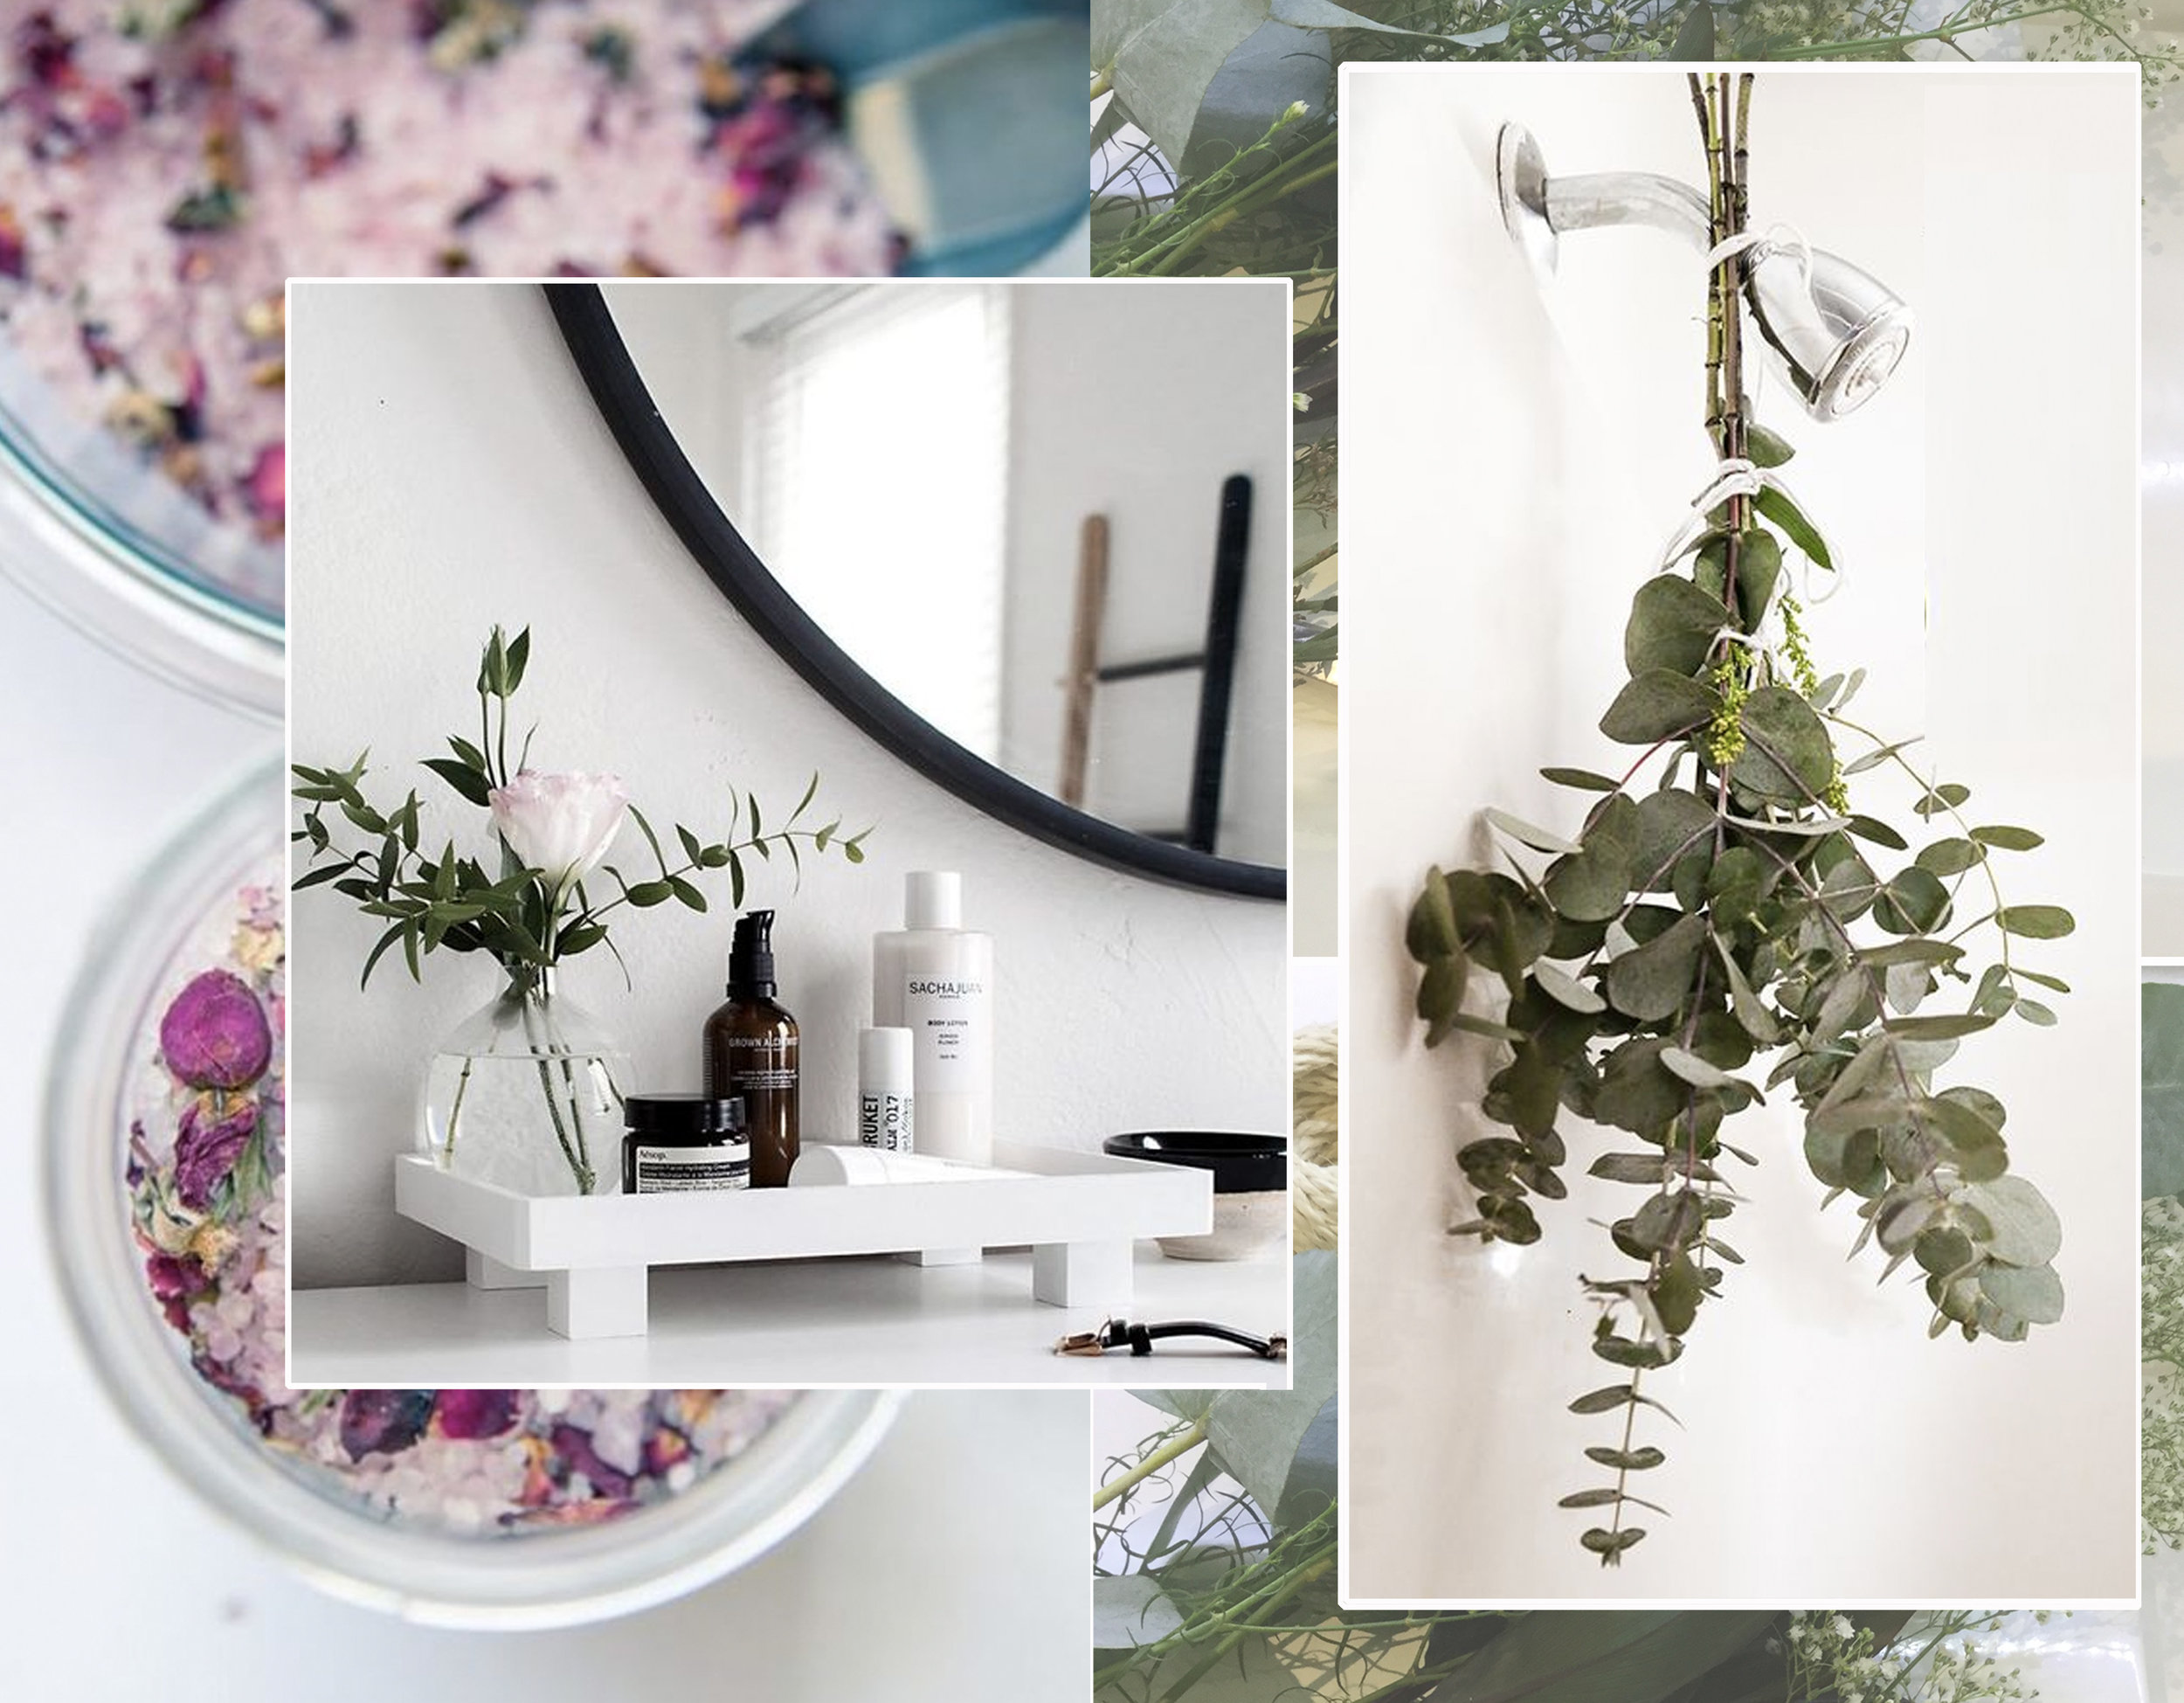 bath salt vis  Sisoo  - vanity tray via  Homeyohmy  - eucalyptus in shower via Astuces de  Grand-mere